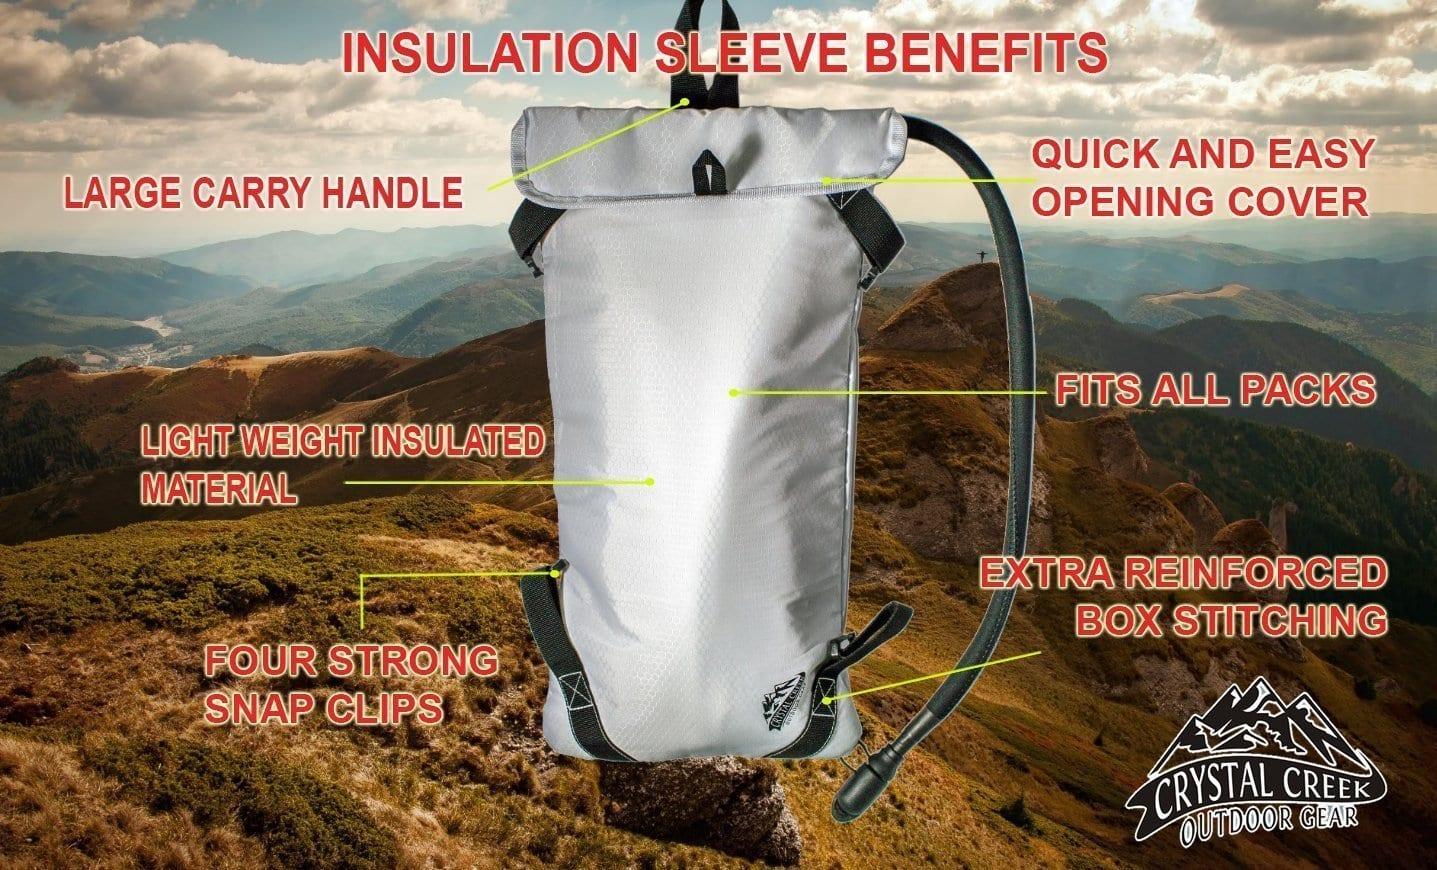 crystal creek 3l hydration bladder insulated sleeve. Black Bedroom Furniture Sets. Home Design Ideas